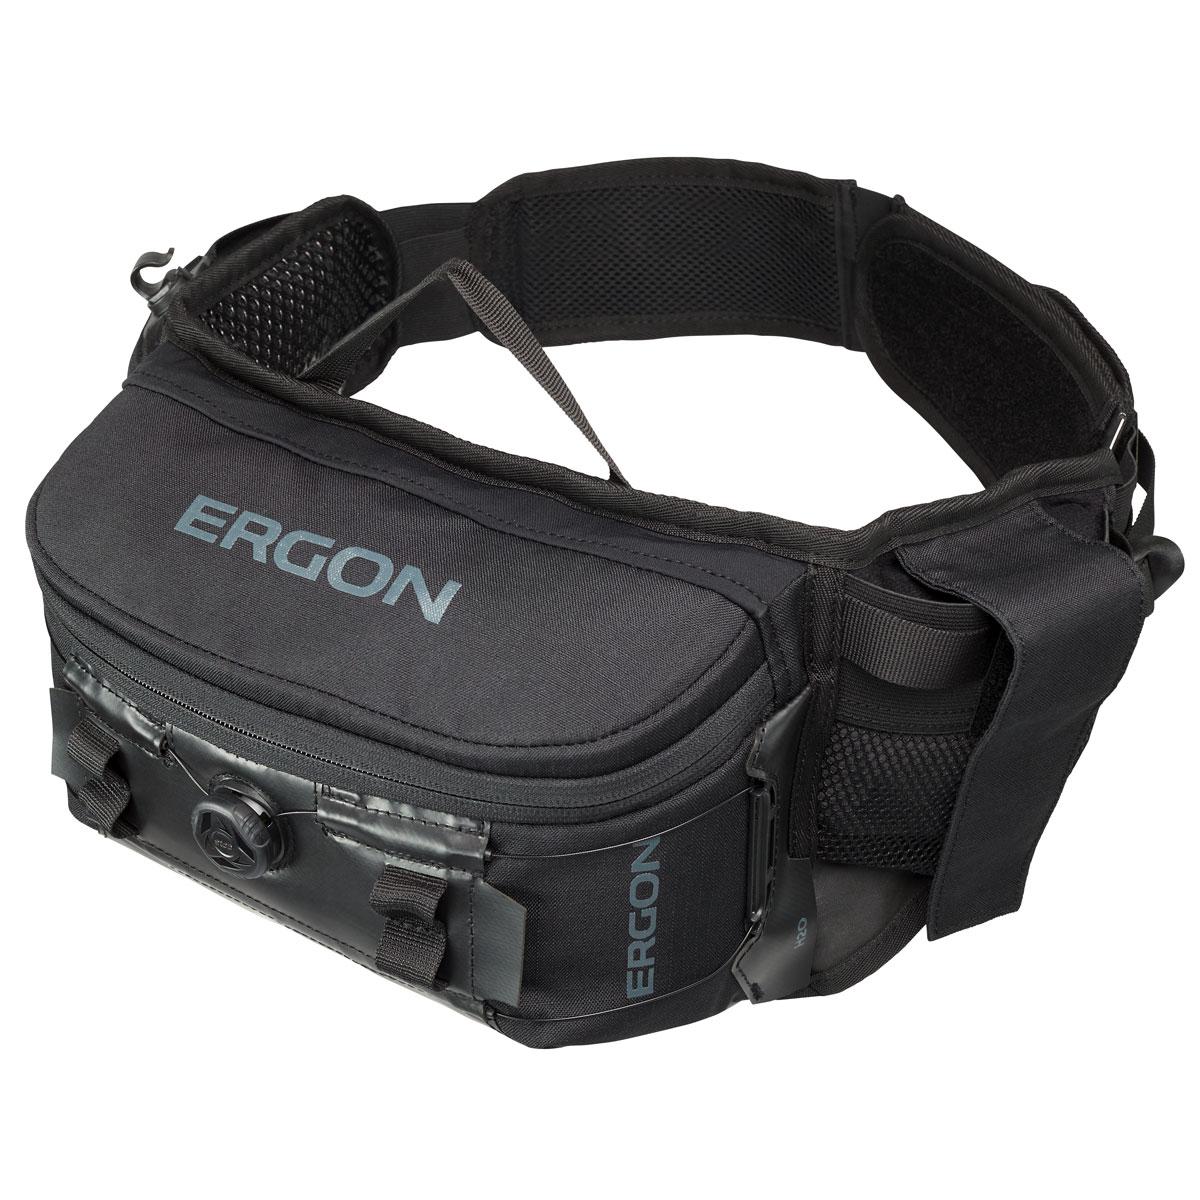 Ergon BA Hip Pack - 3L - Black